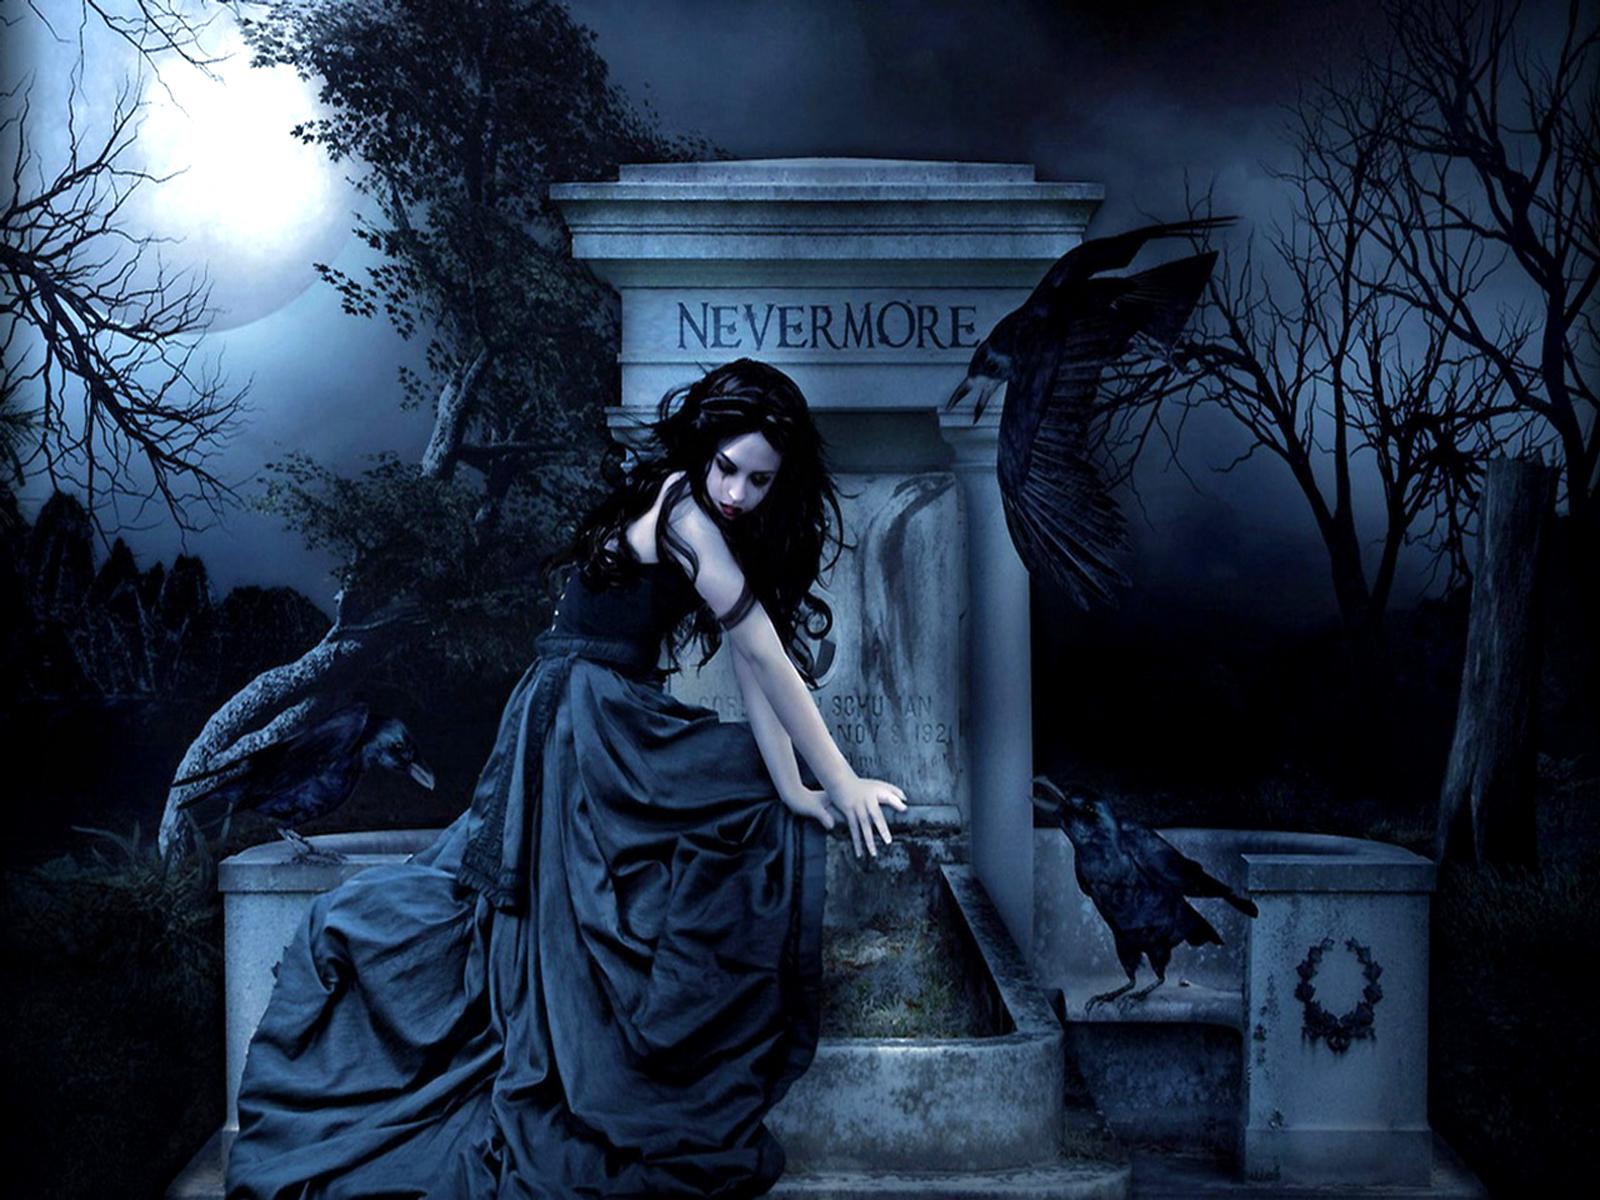 Gothic women dark fantasy poe raven wallpaper 1600x1200 28003 1600x1200